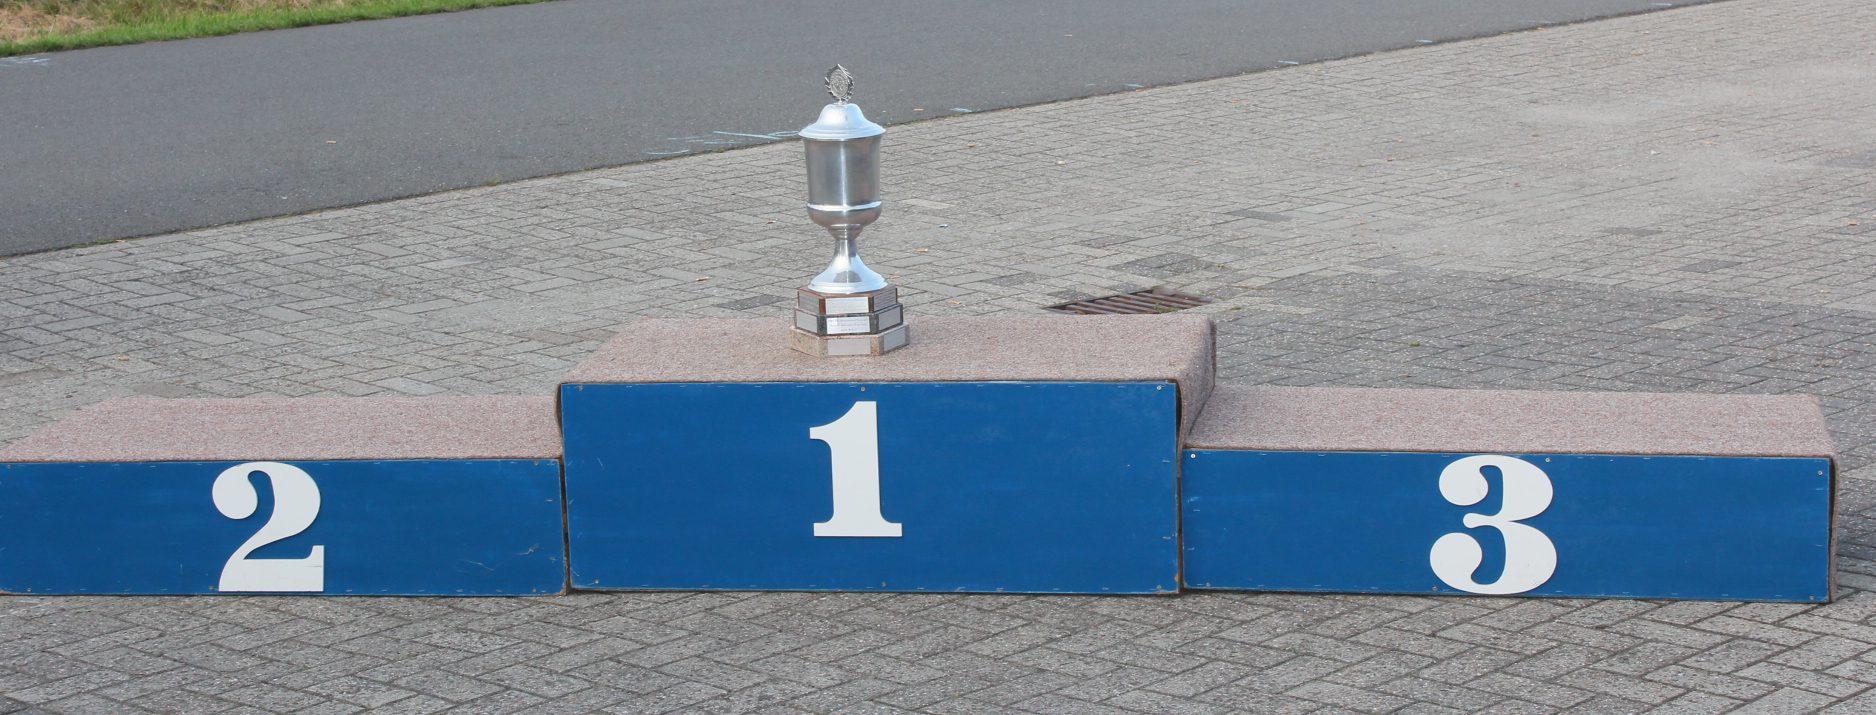 Fehntjer Cup 2019